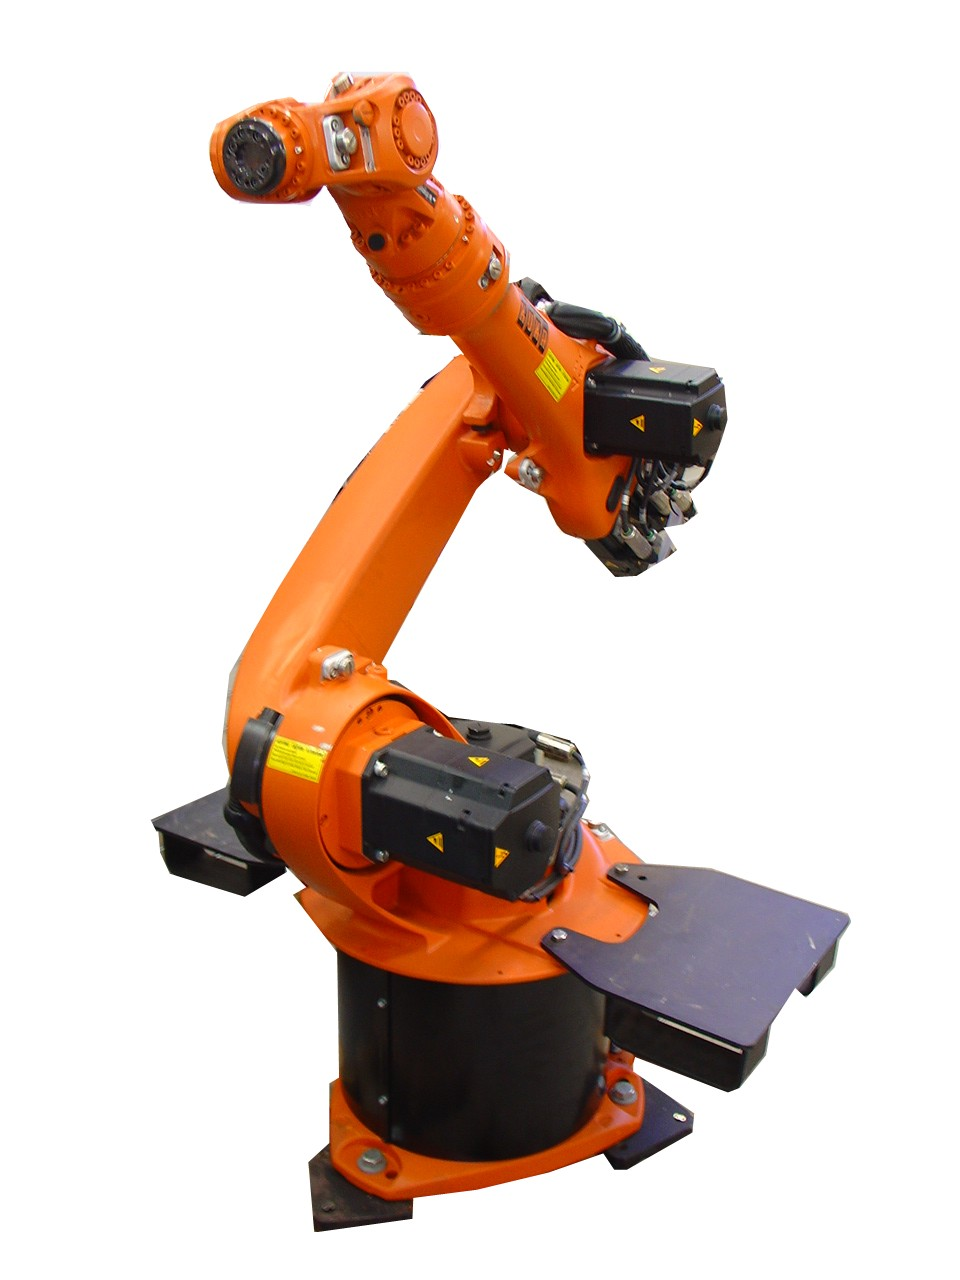 Kuka Kr16 Industrial Robot Exapro